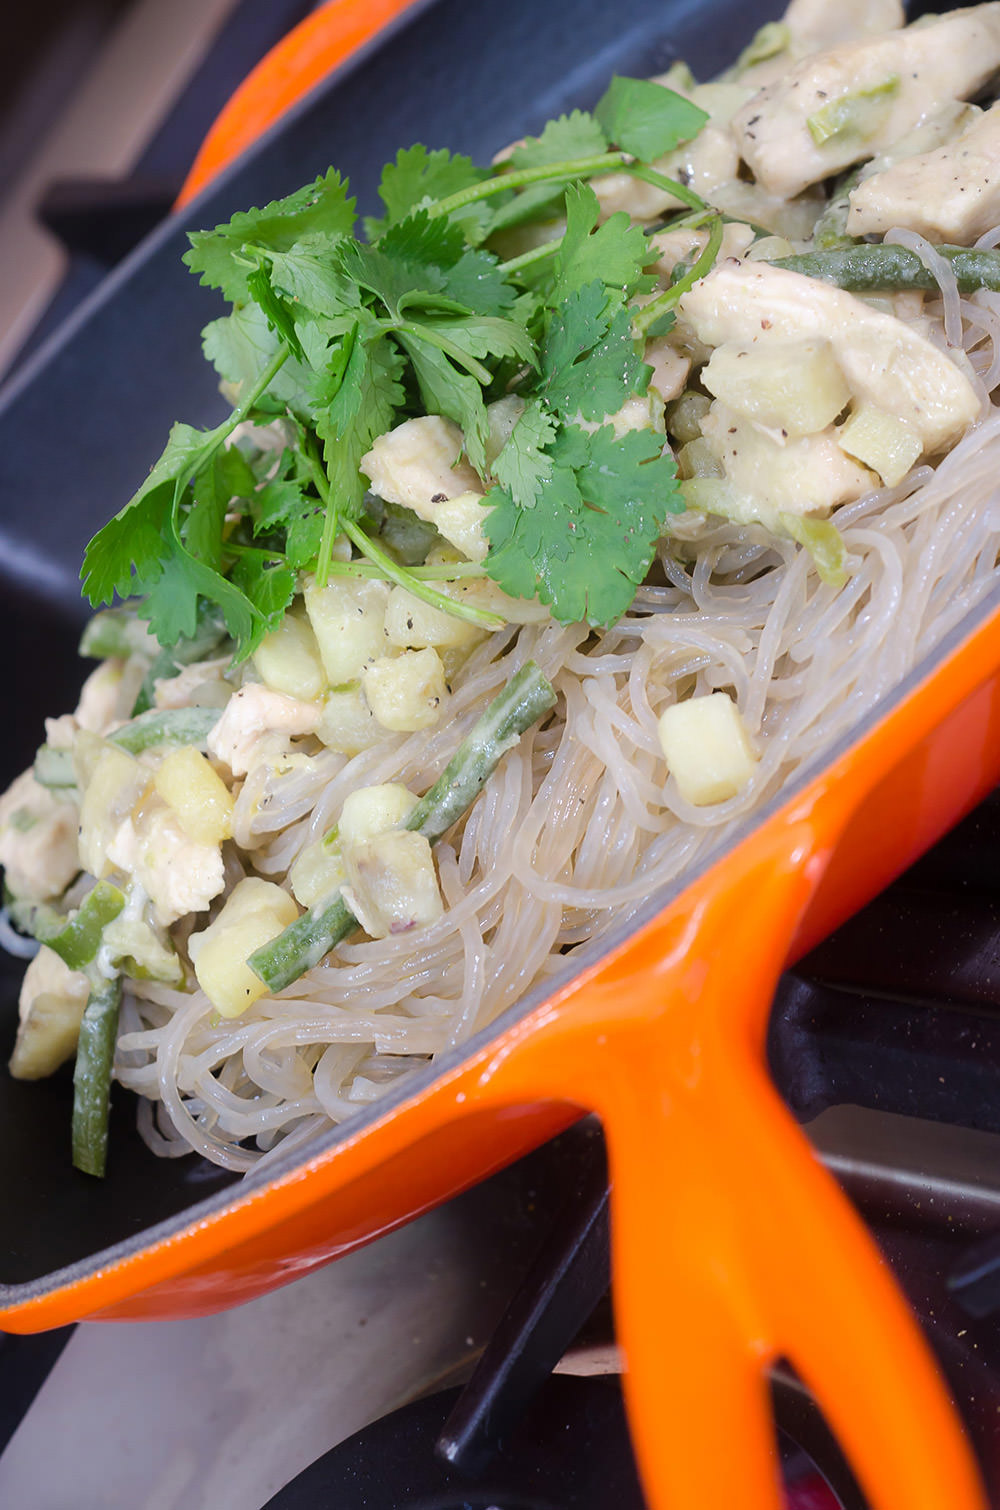 Johns' Green Chicken Thai Curry / Karen E Photography (p)